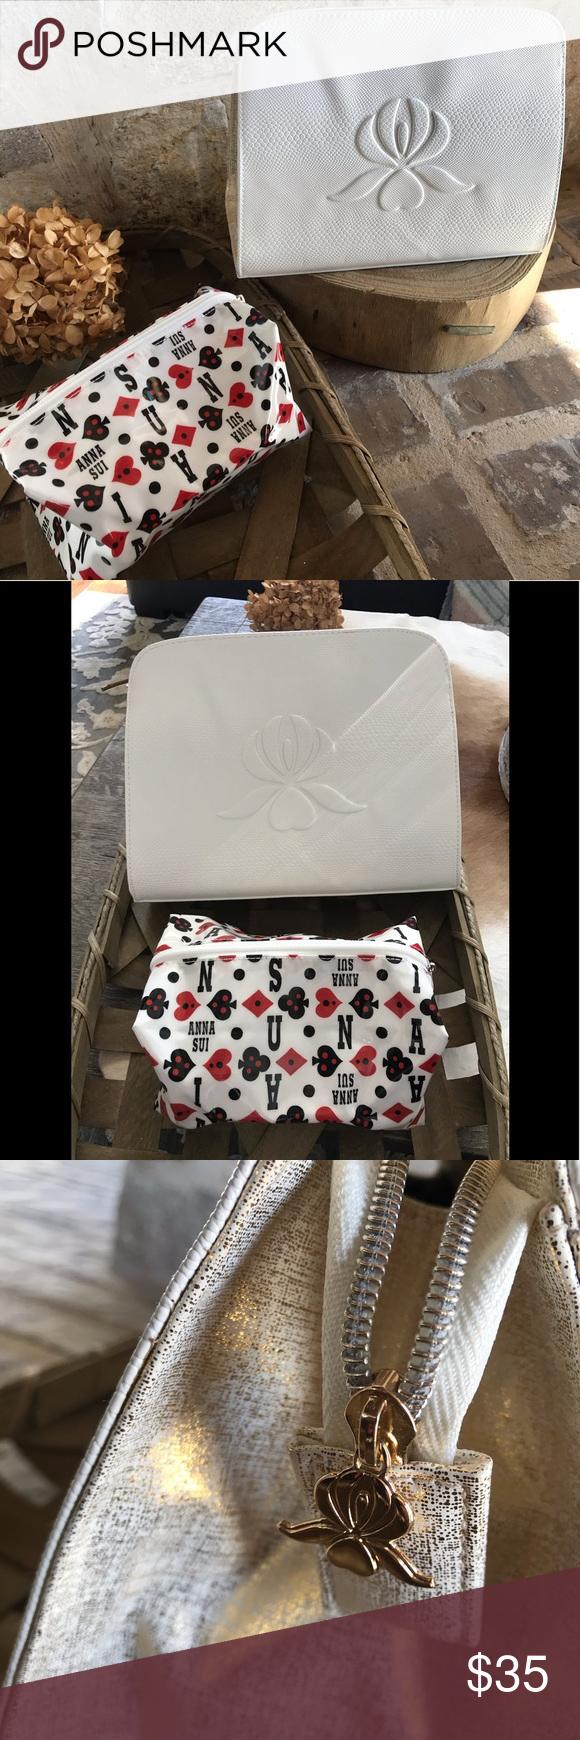 NWOT Bundle of 2 Sisley/Anna Sui Makeup Bags This listing